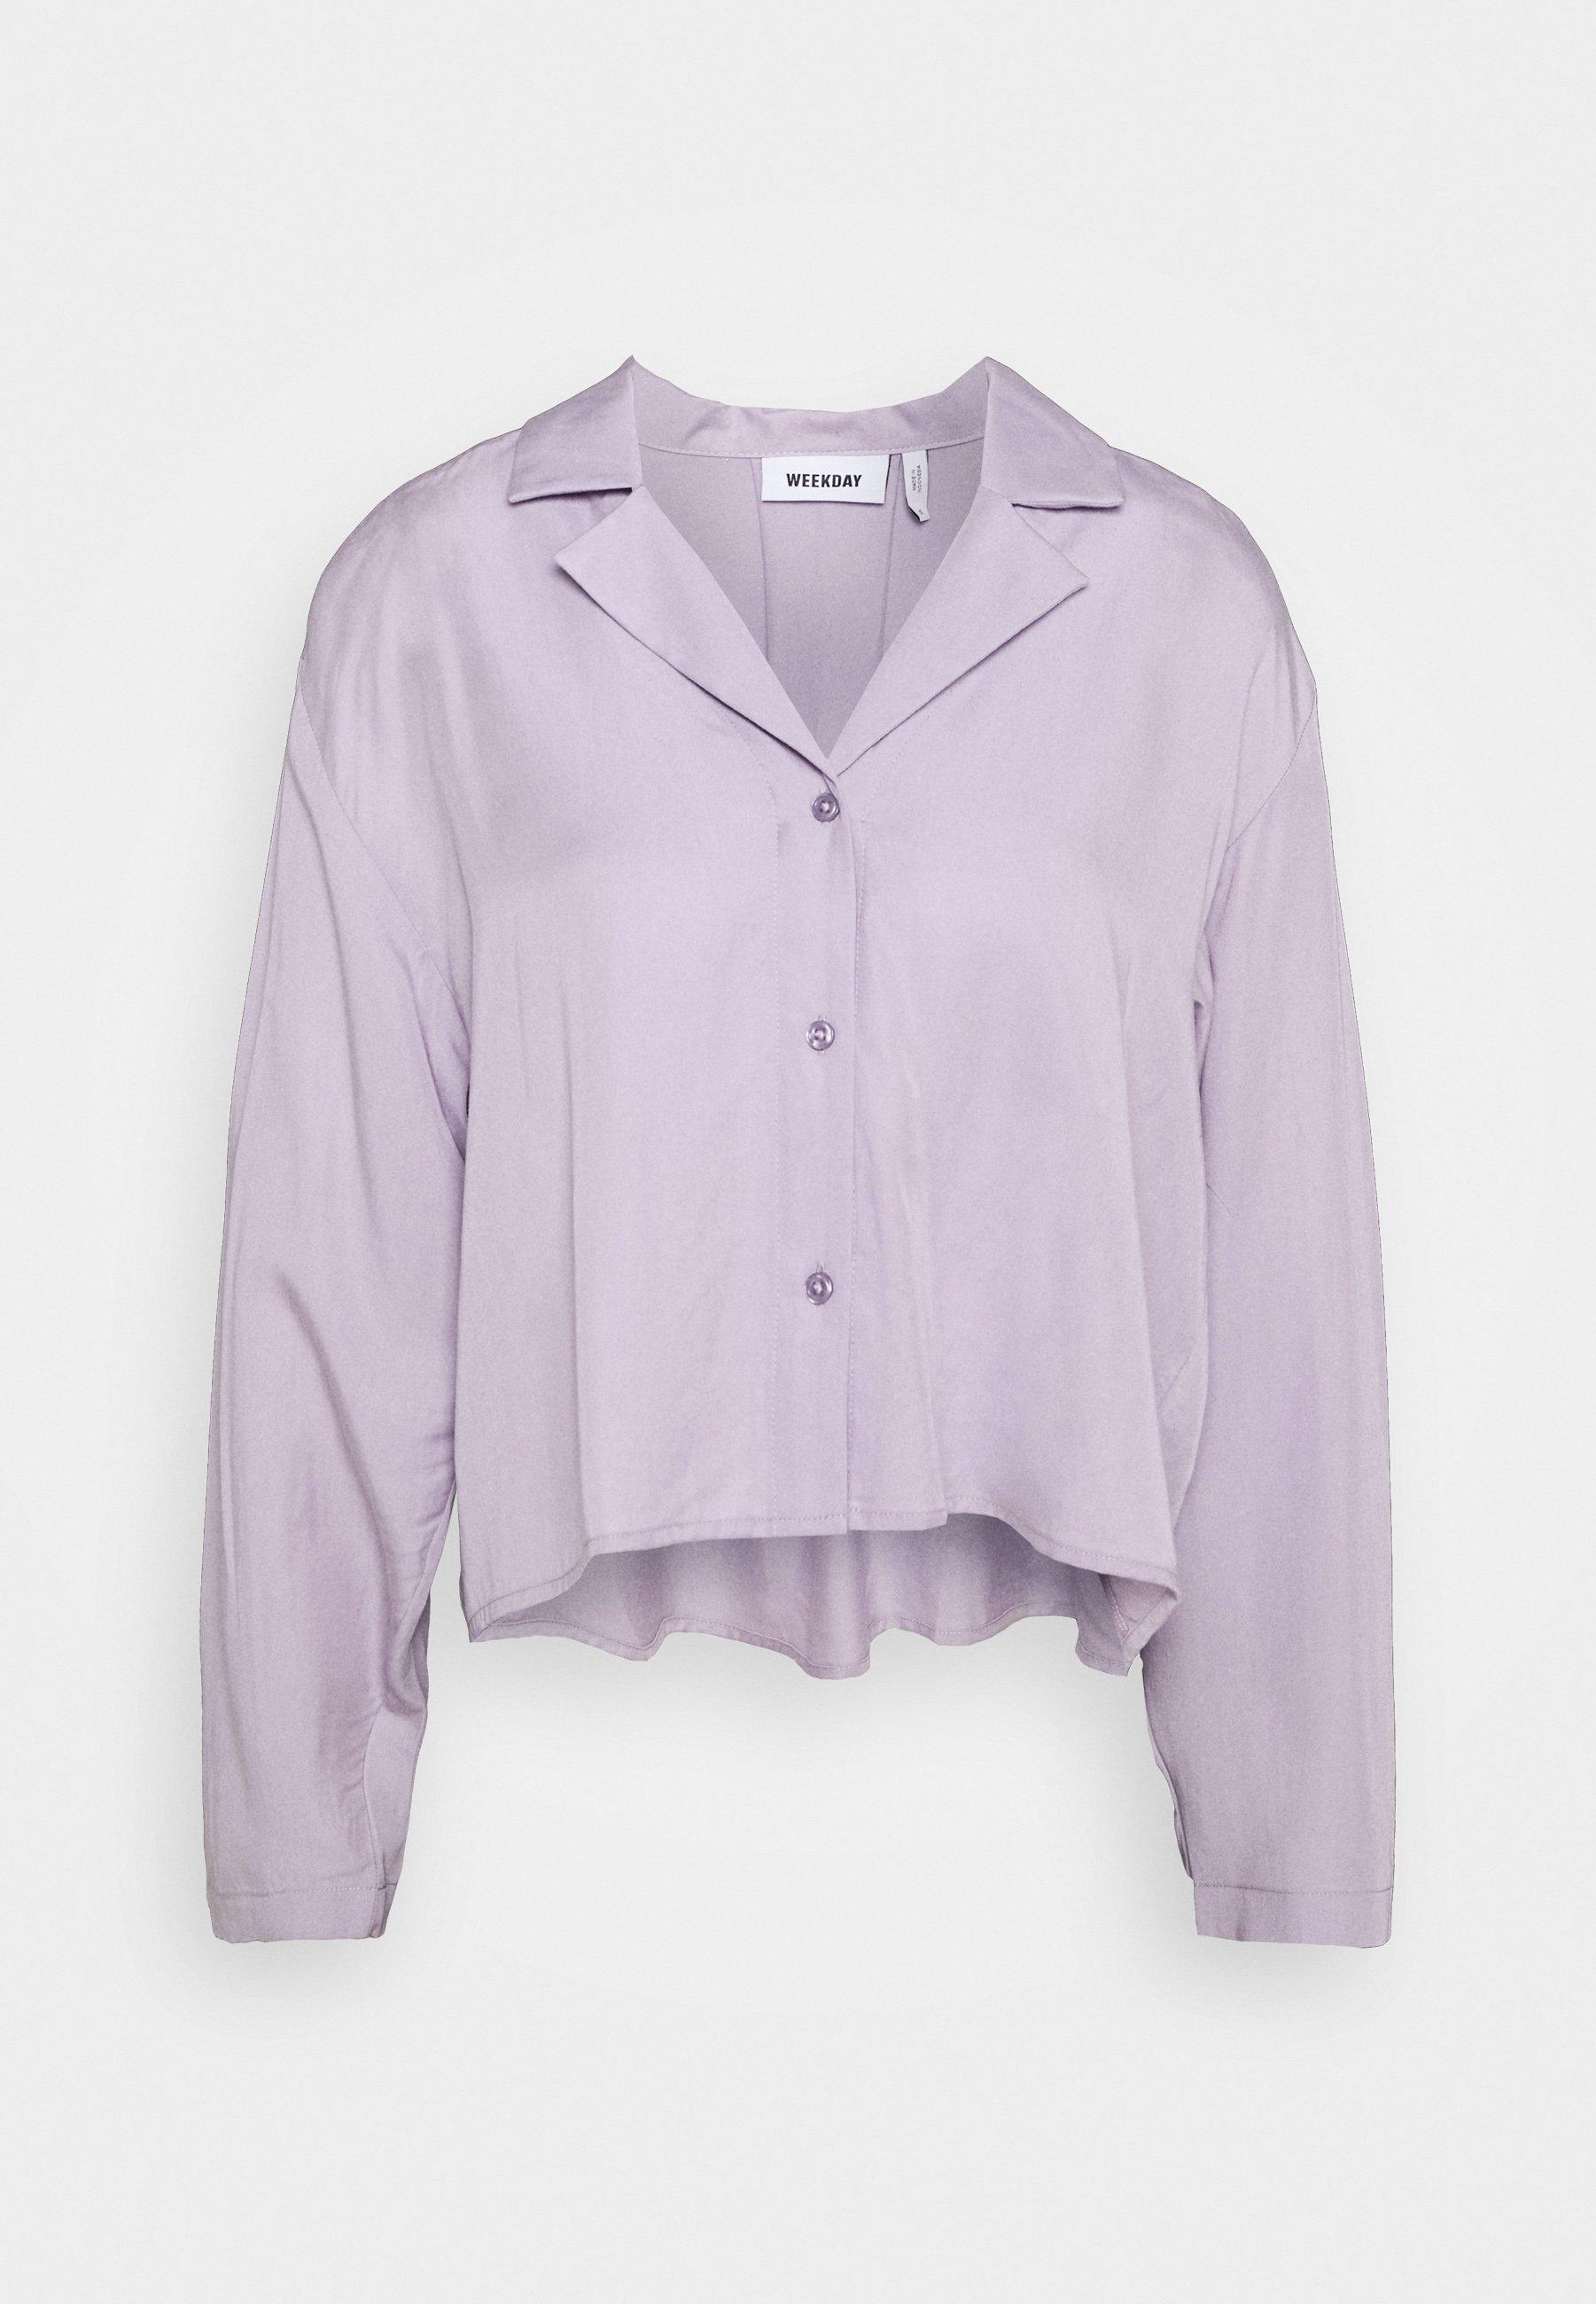 Weekday FILIPPA BLOUSE - Skjortebluser - dusty purple -  3wvib